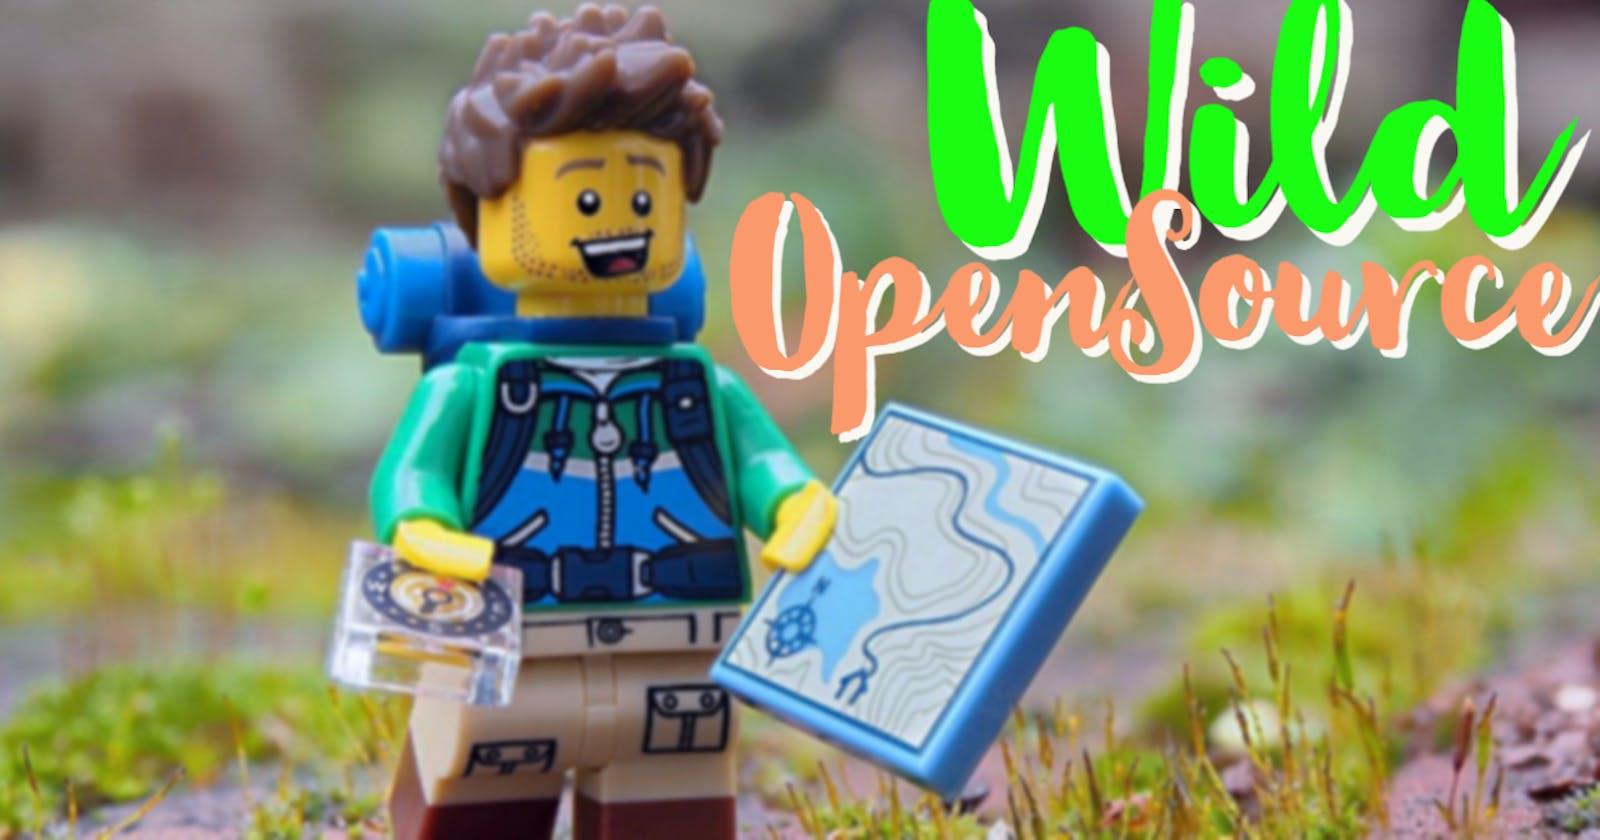 Open Source Wilderness